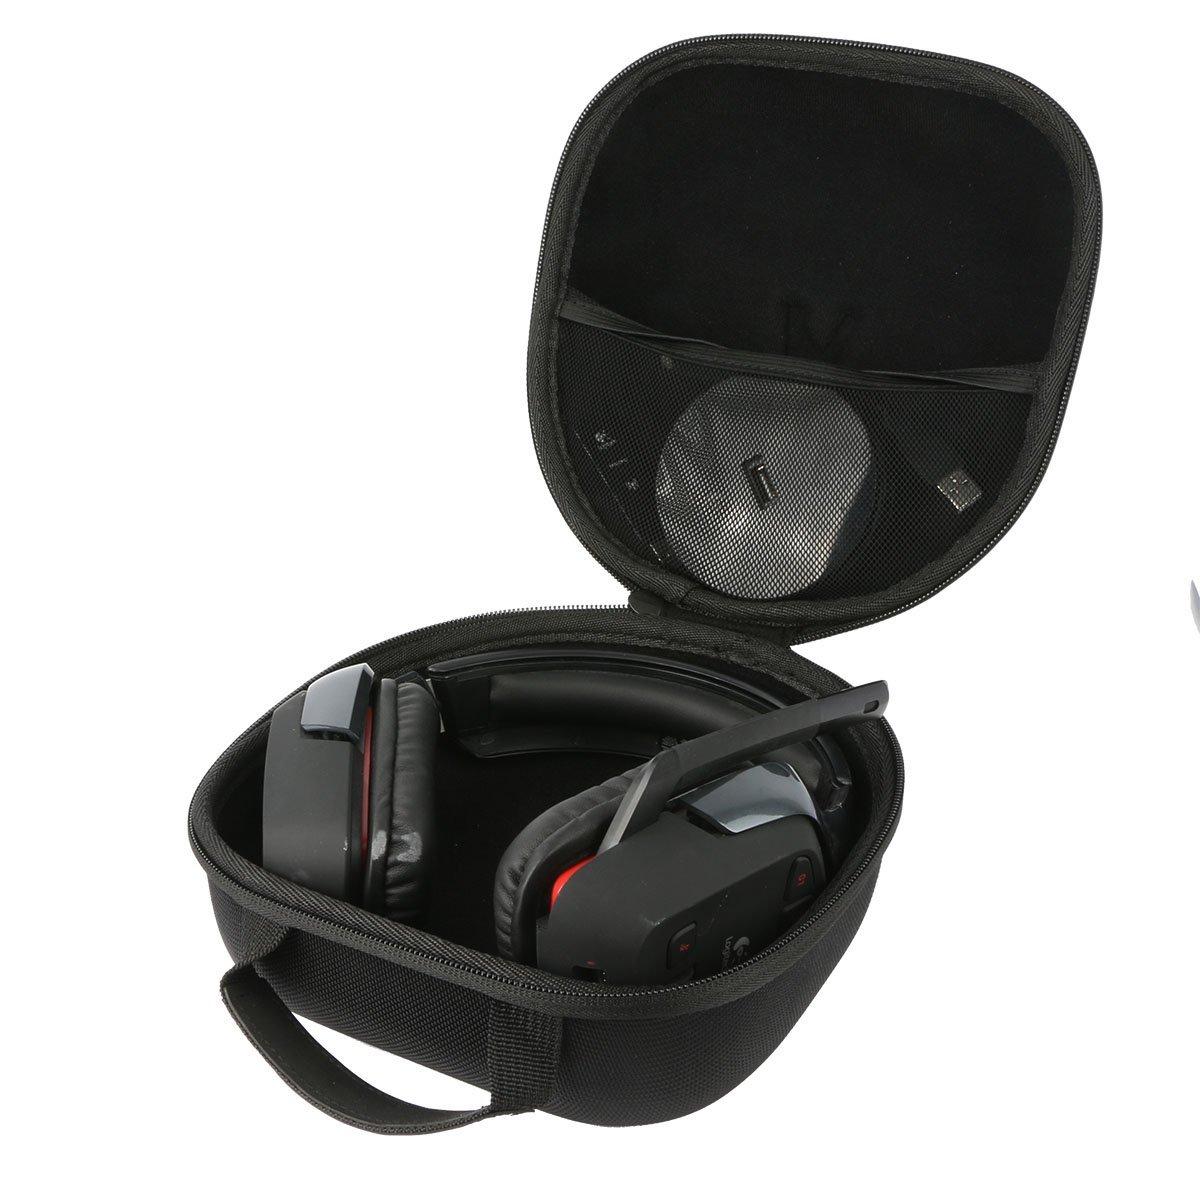 LOGITECH WIRELESS GAMING HEADSET G930 64BIT DRIVER